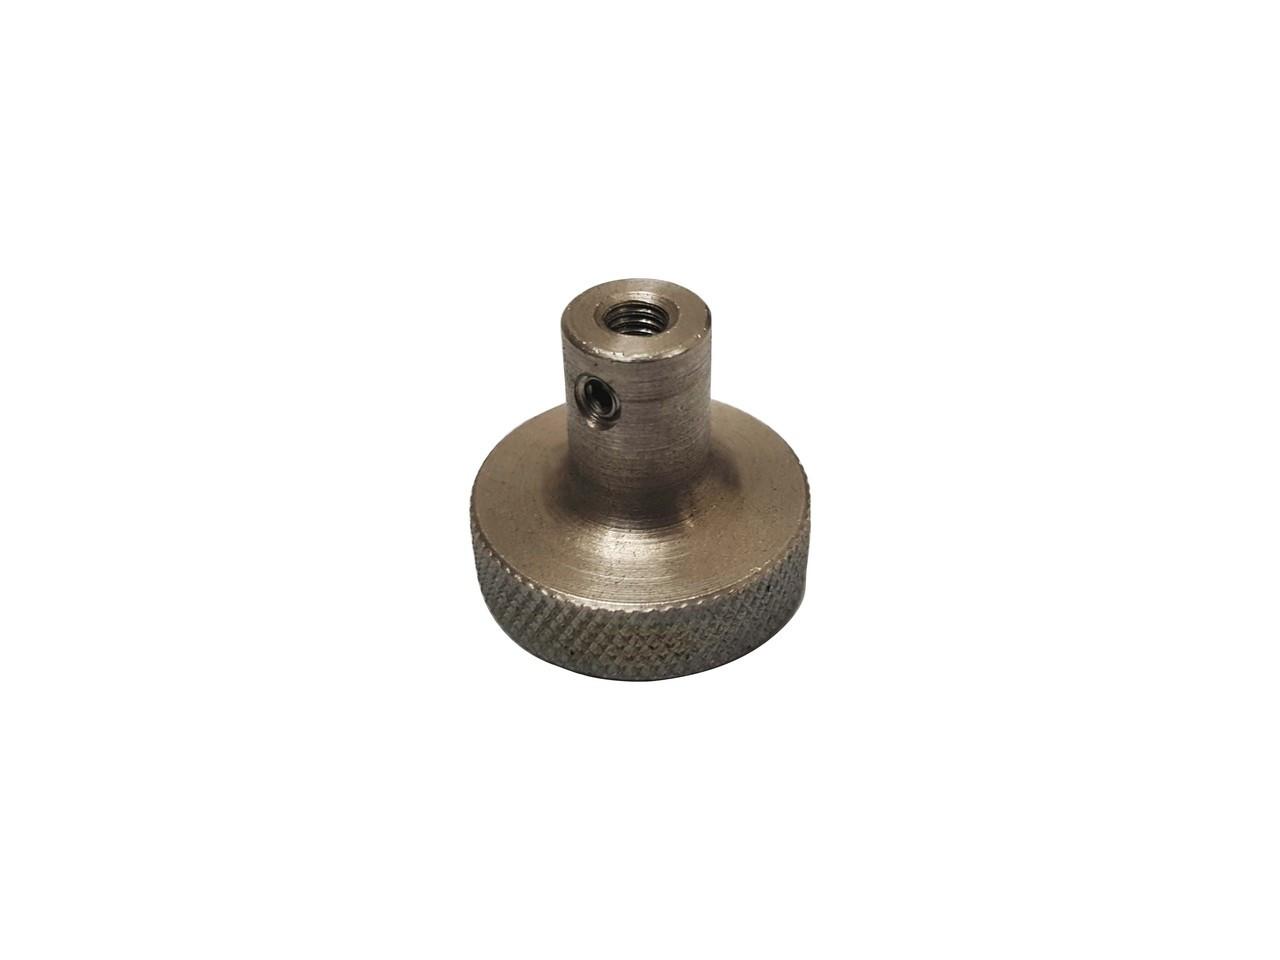 Bizerba Slicer - Small Clamping Handle - SE12 - BZ005